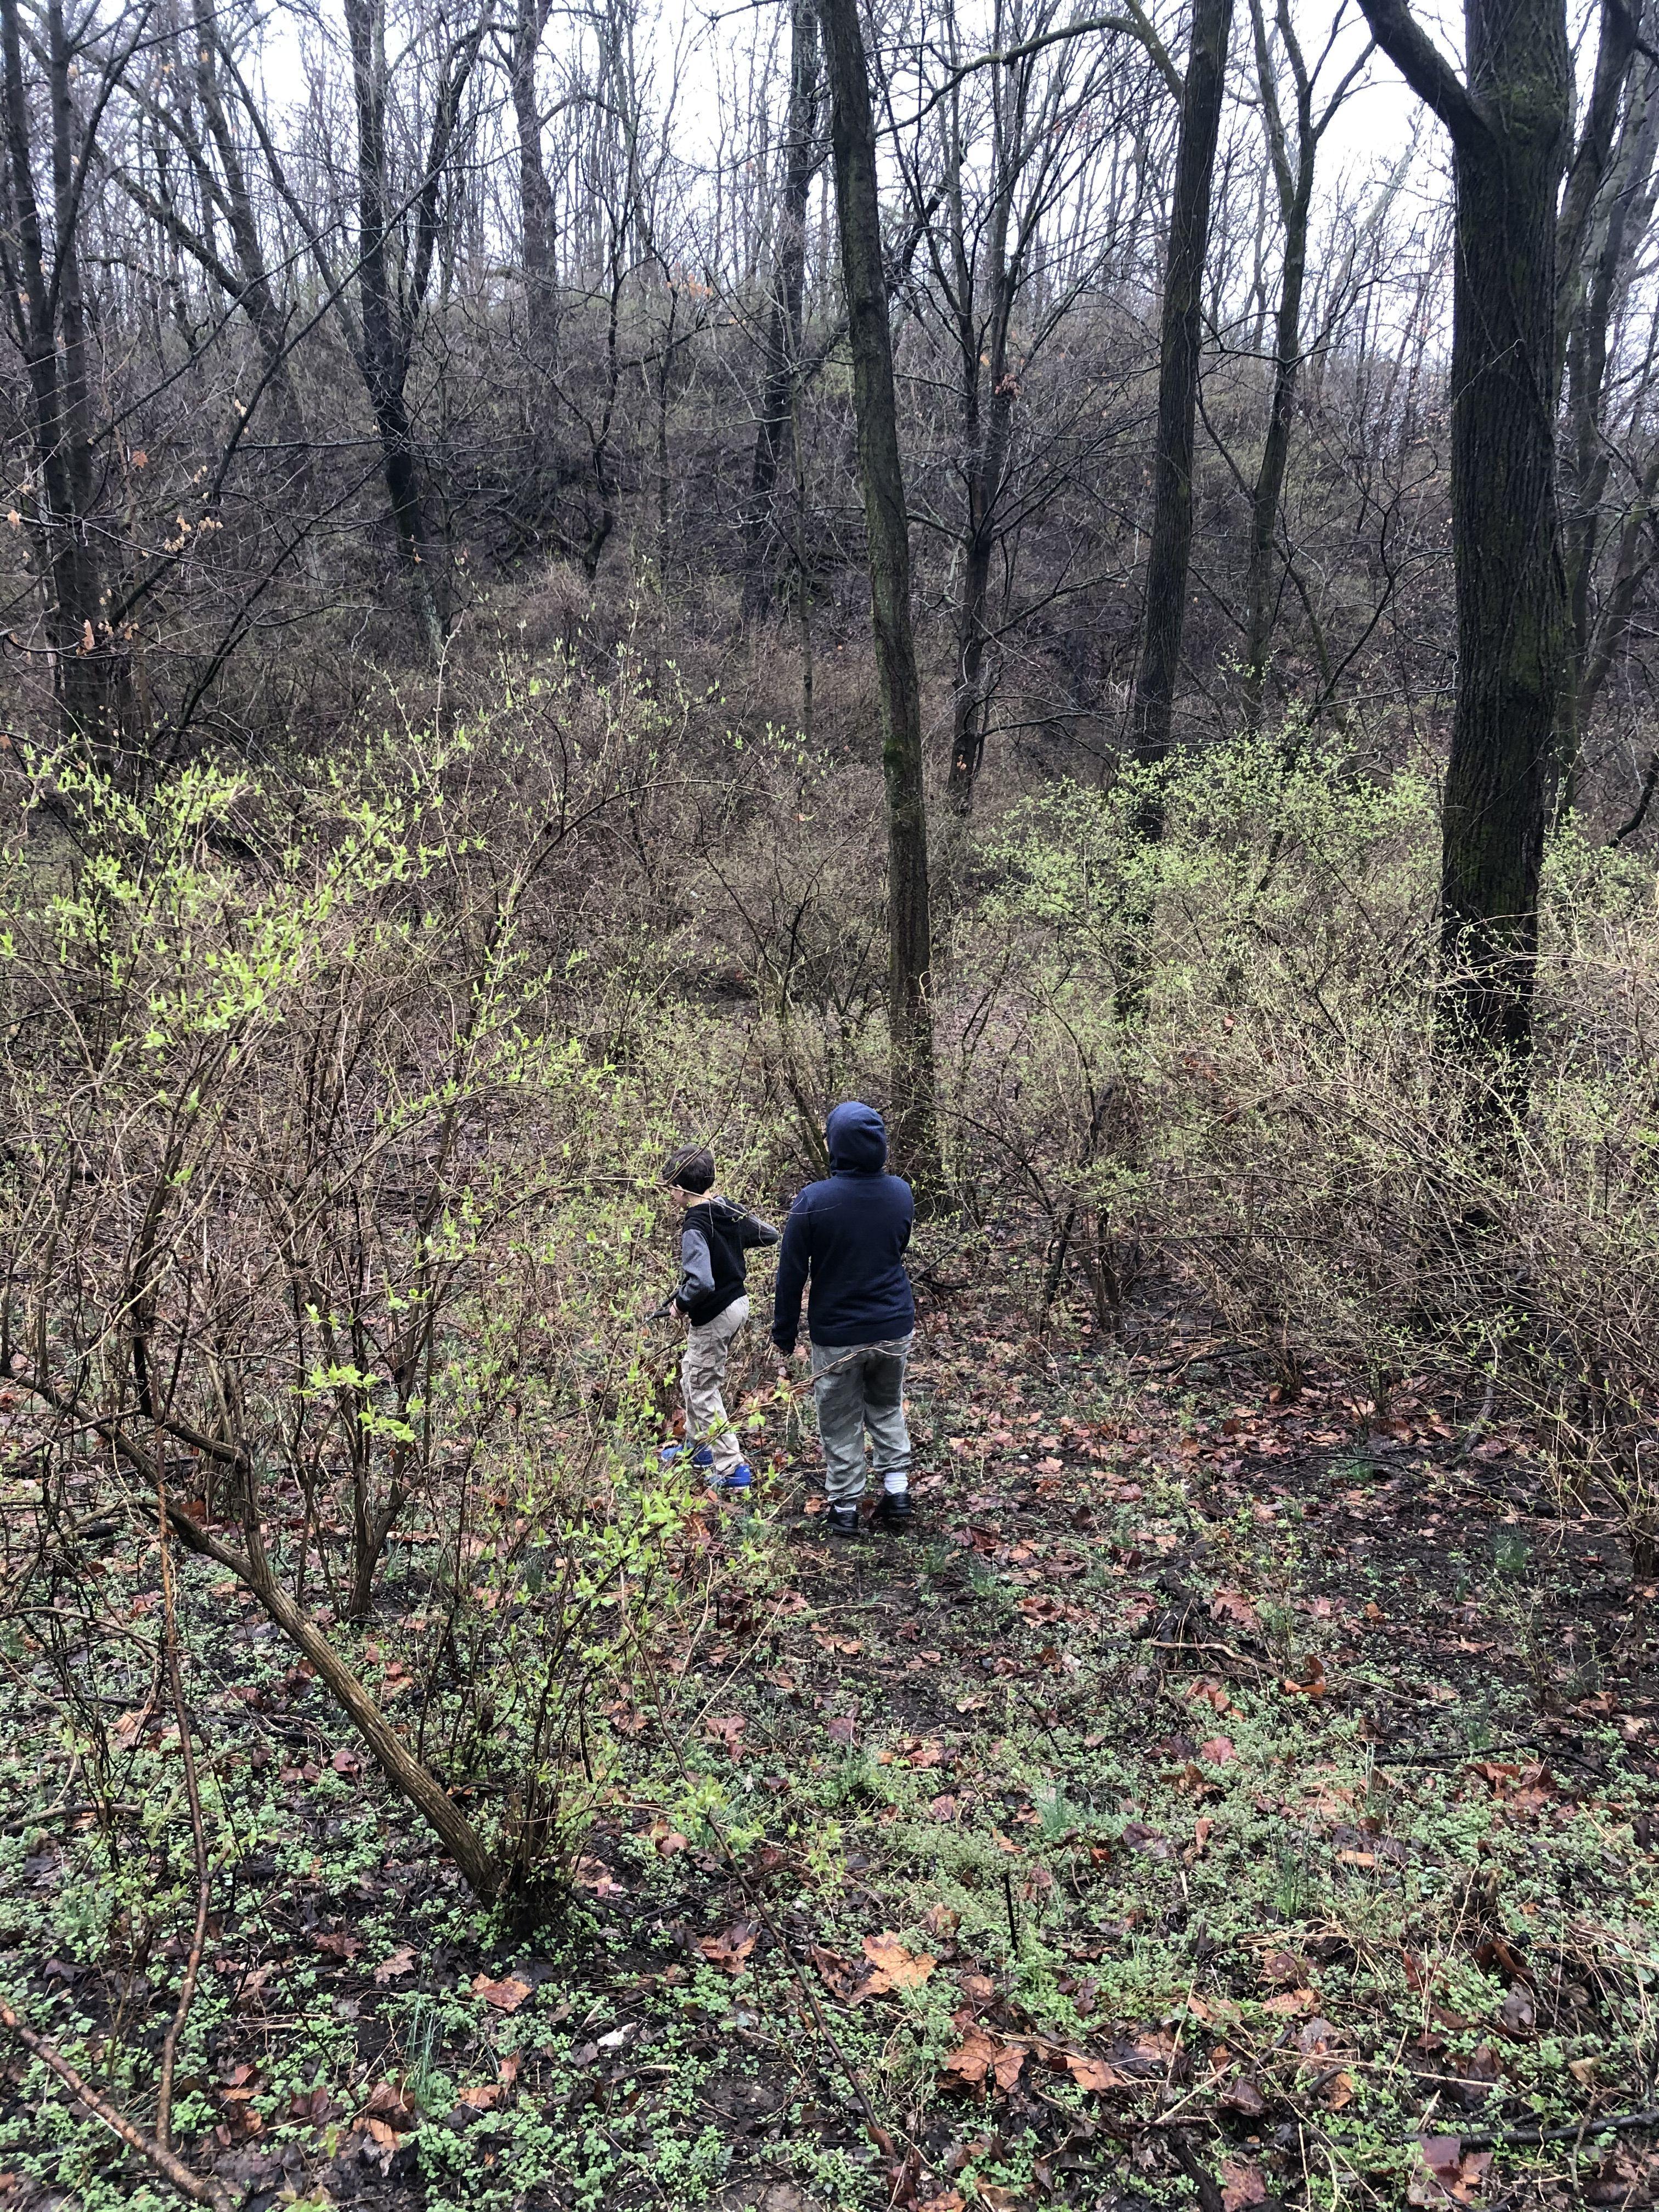 Exploring Our Own Backyard in 2020 | Backyard, Working ...